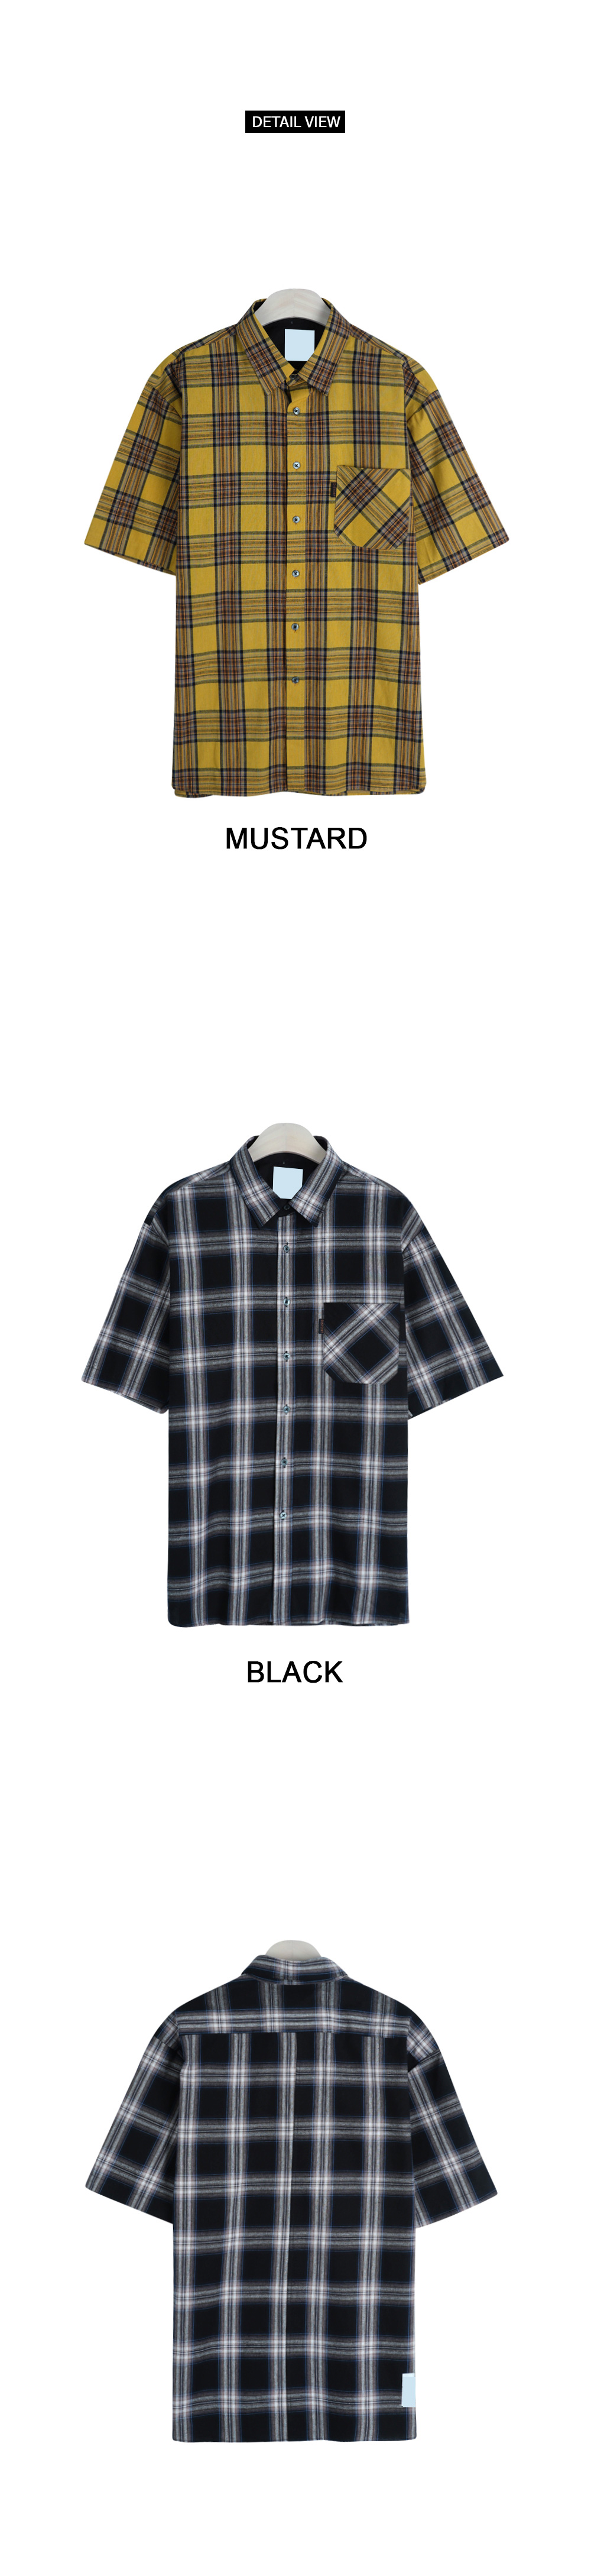 Club Check Short Sleeve Shirt